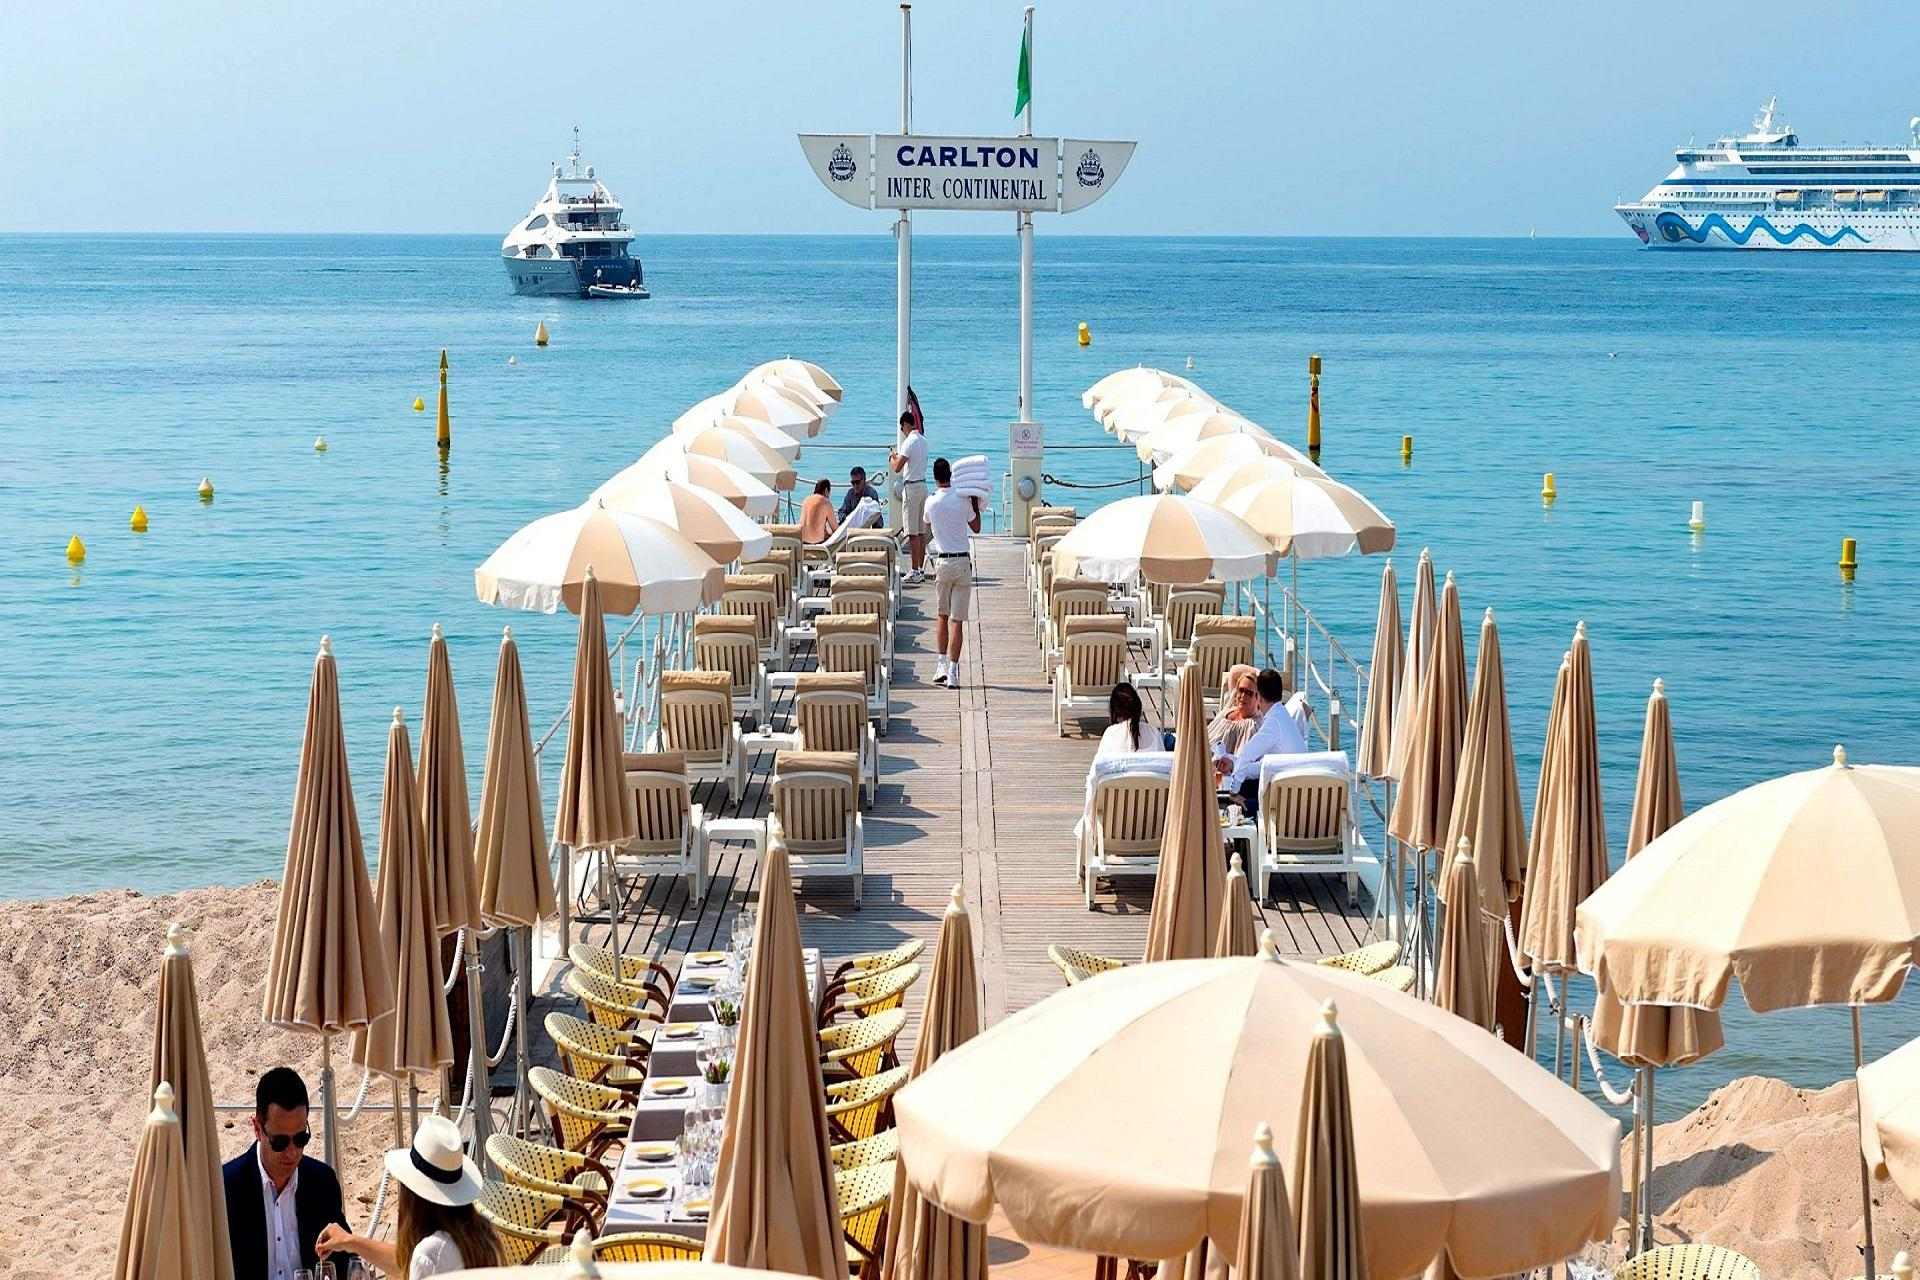 Carlton-Cannes-French-Riviera-cote-dazur-Croisette-ponton-plage